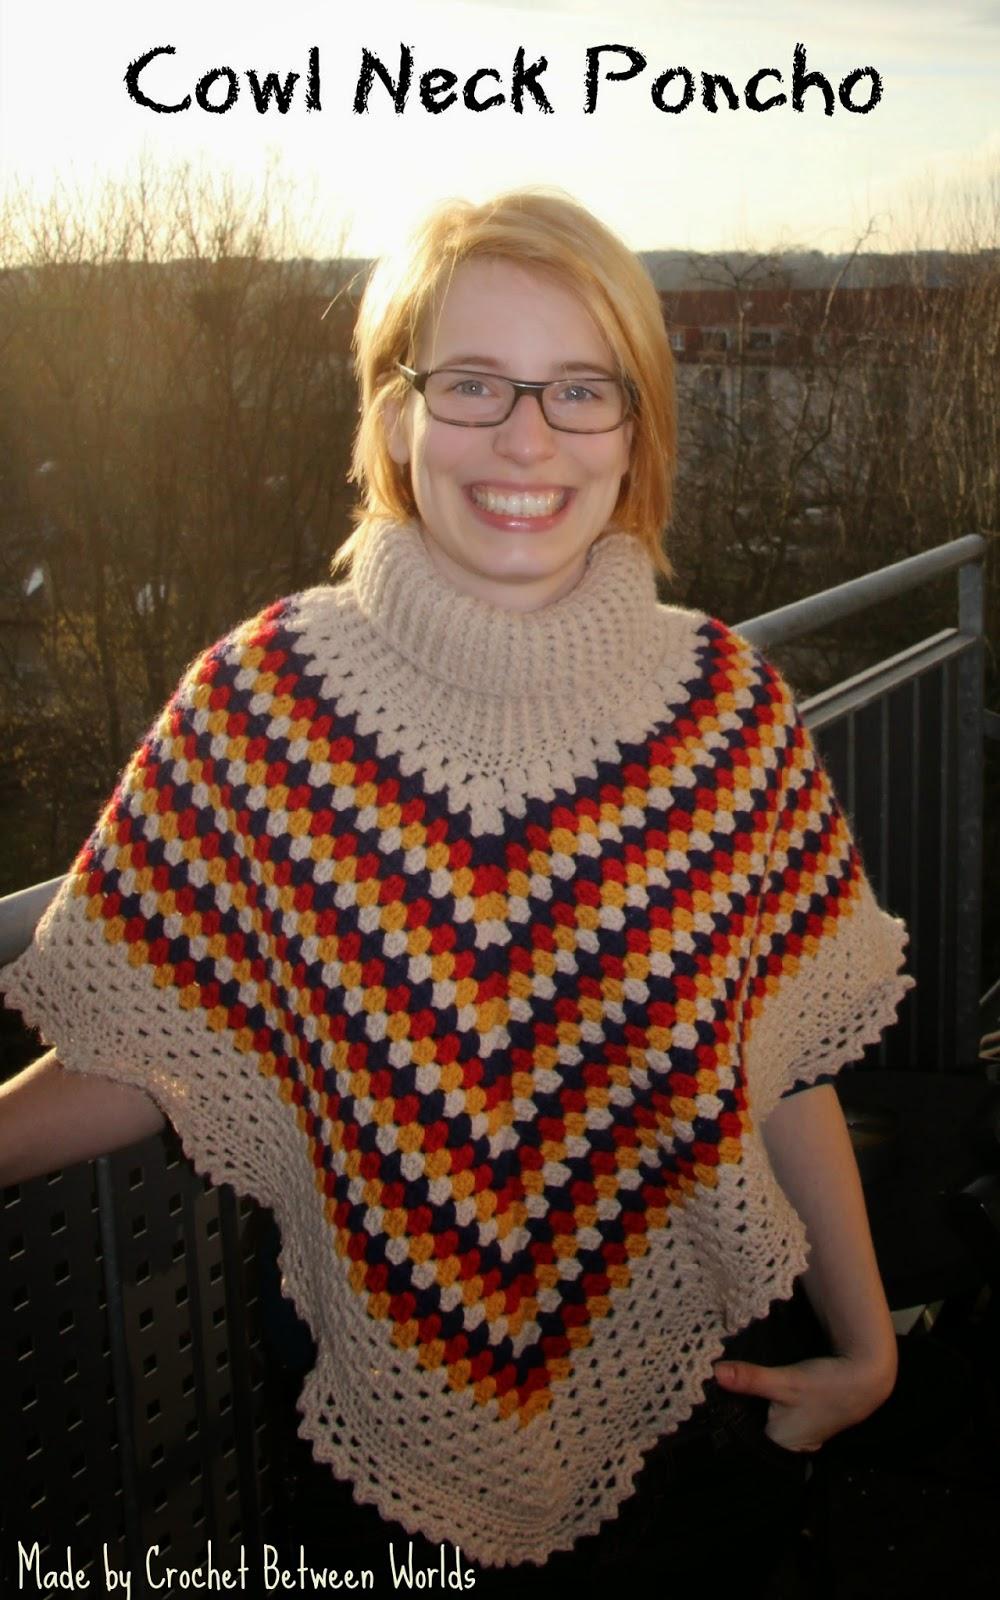 Crochet Between Worlds Cowl Neck Poncho Love